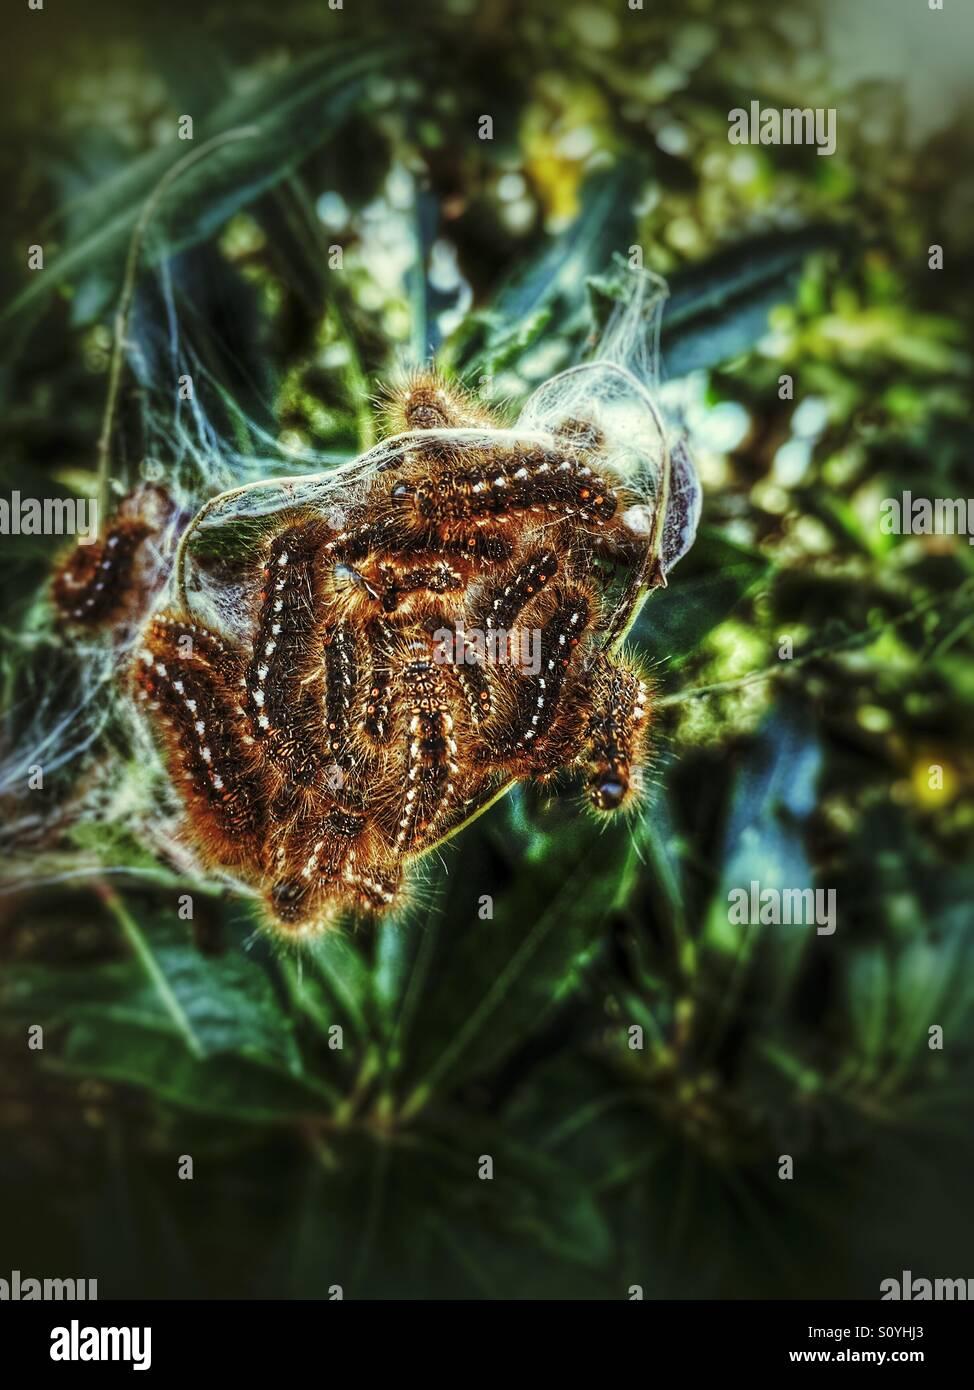 Caterpillars - Stock Image